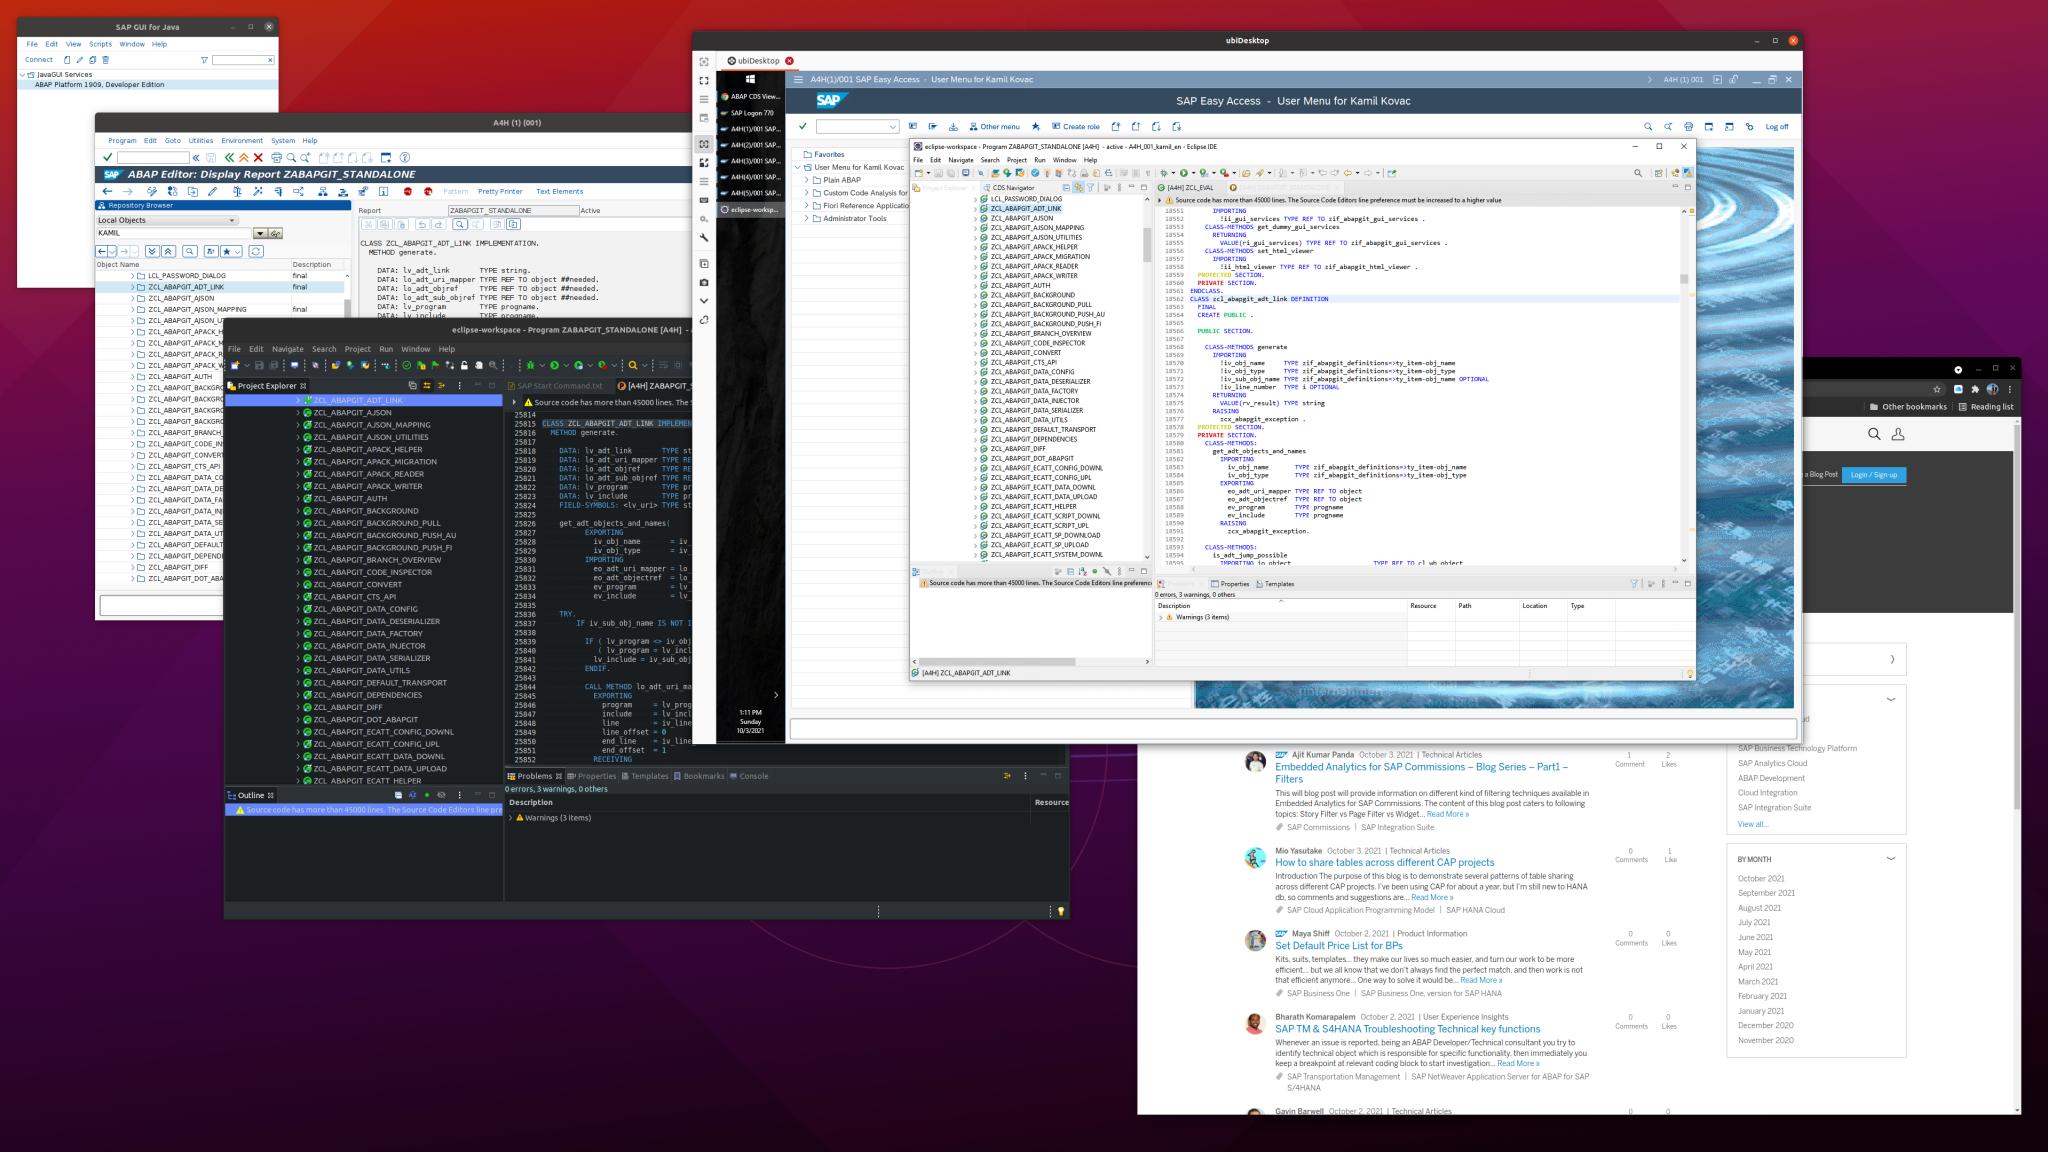 Linux%20and%20apps.%20SAP%20Gui%2C%20Eclipse%2C%20Remmina%20remote%20access